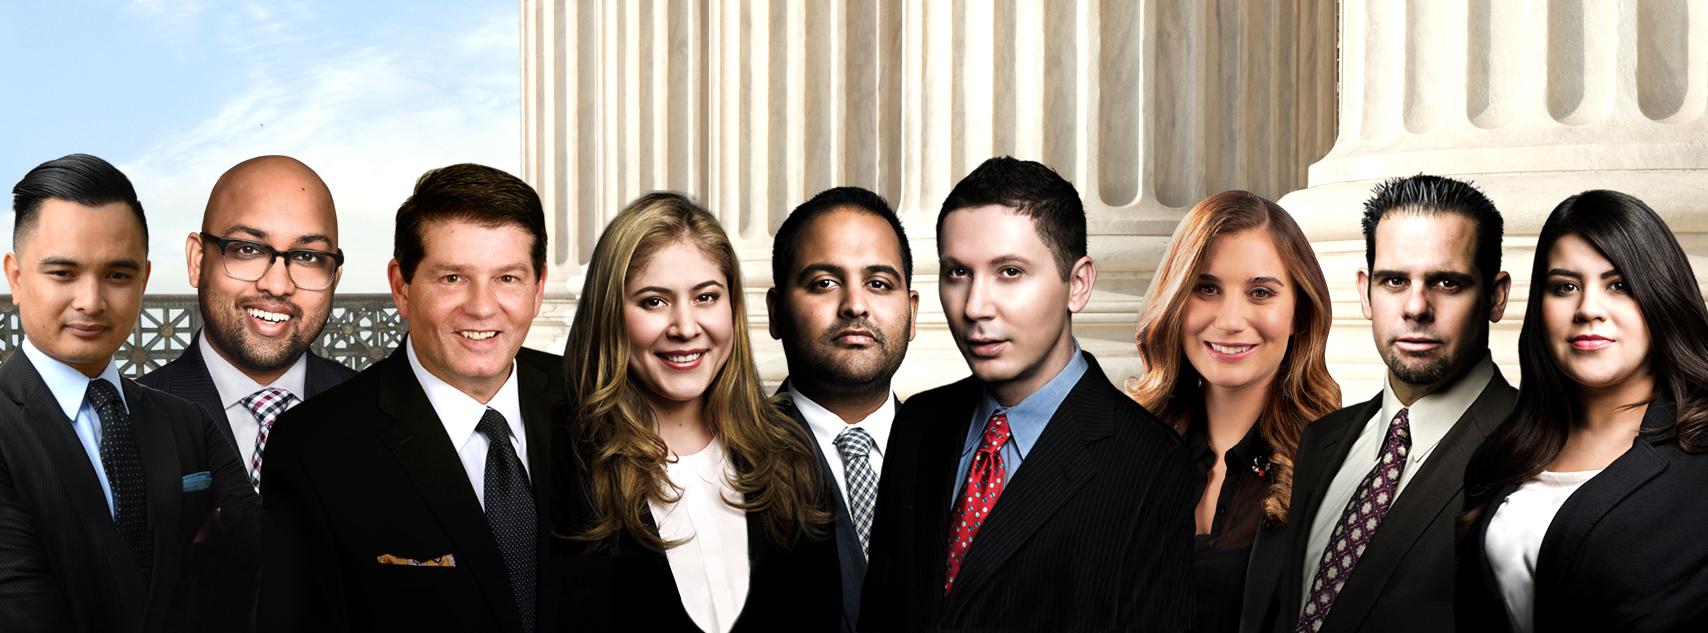 Shouse Law Group reviews | Criminal Defense Law at 3111 Camino Del Rio N #400 - San Diego CA